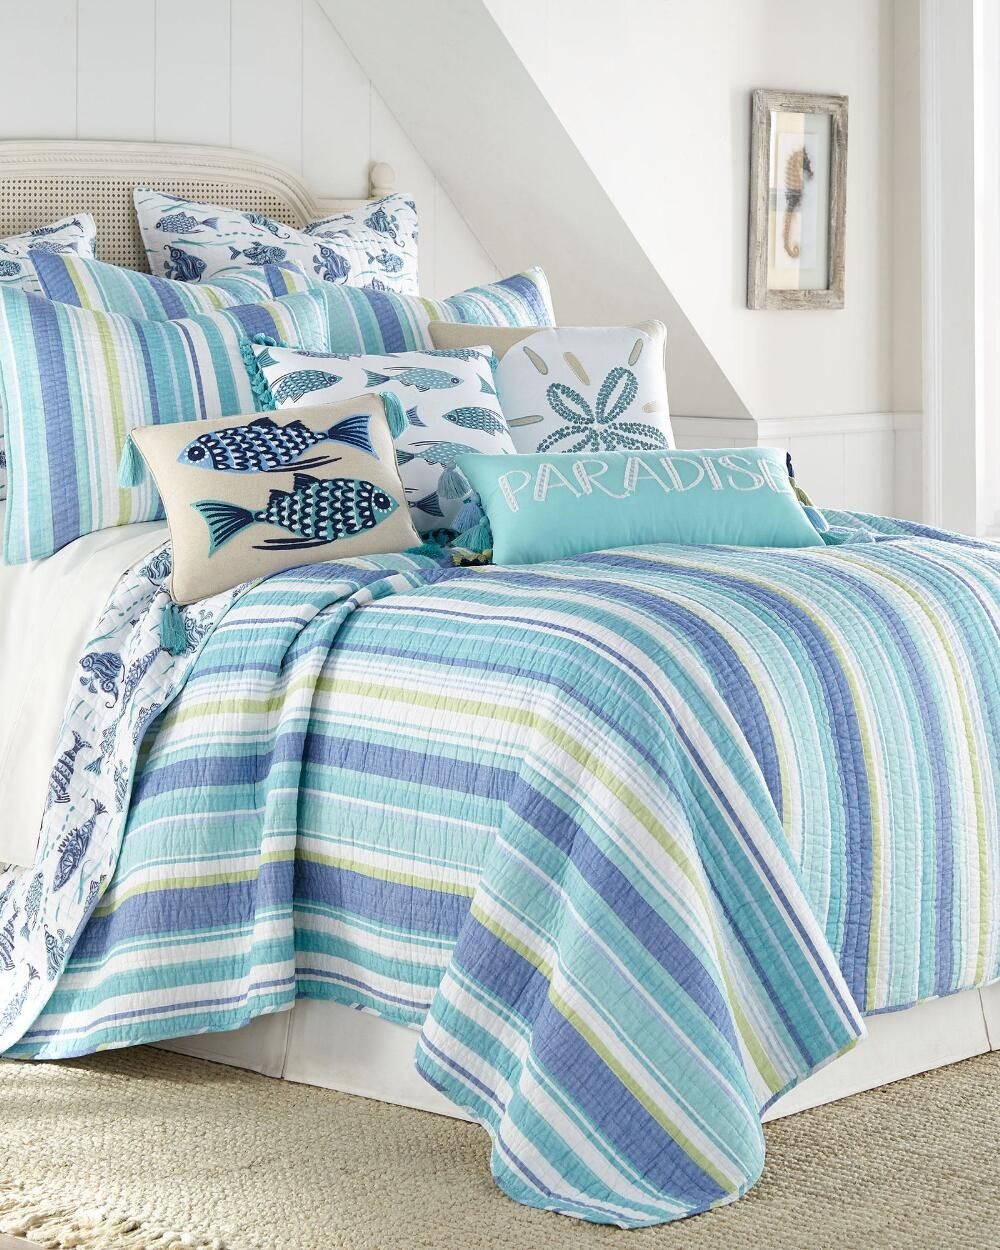 Avila Beach Standard Sham Coastal Bedrooms Home Decor Beach